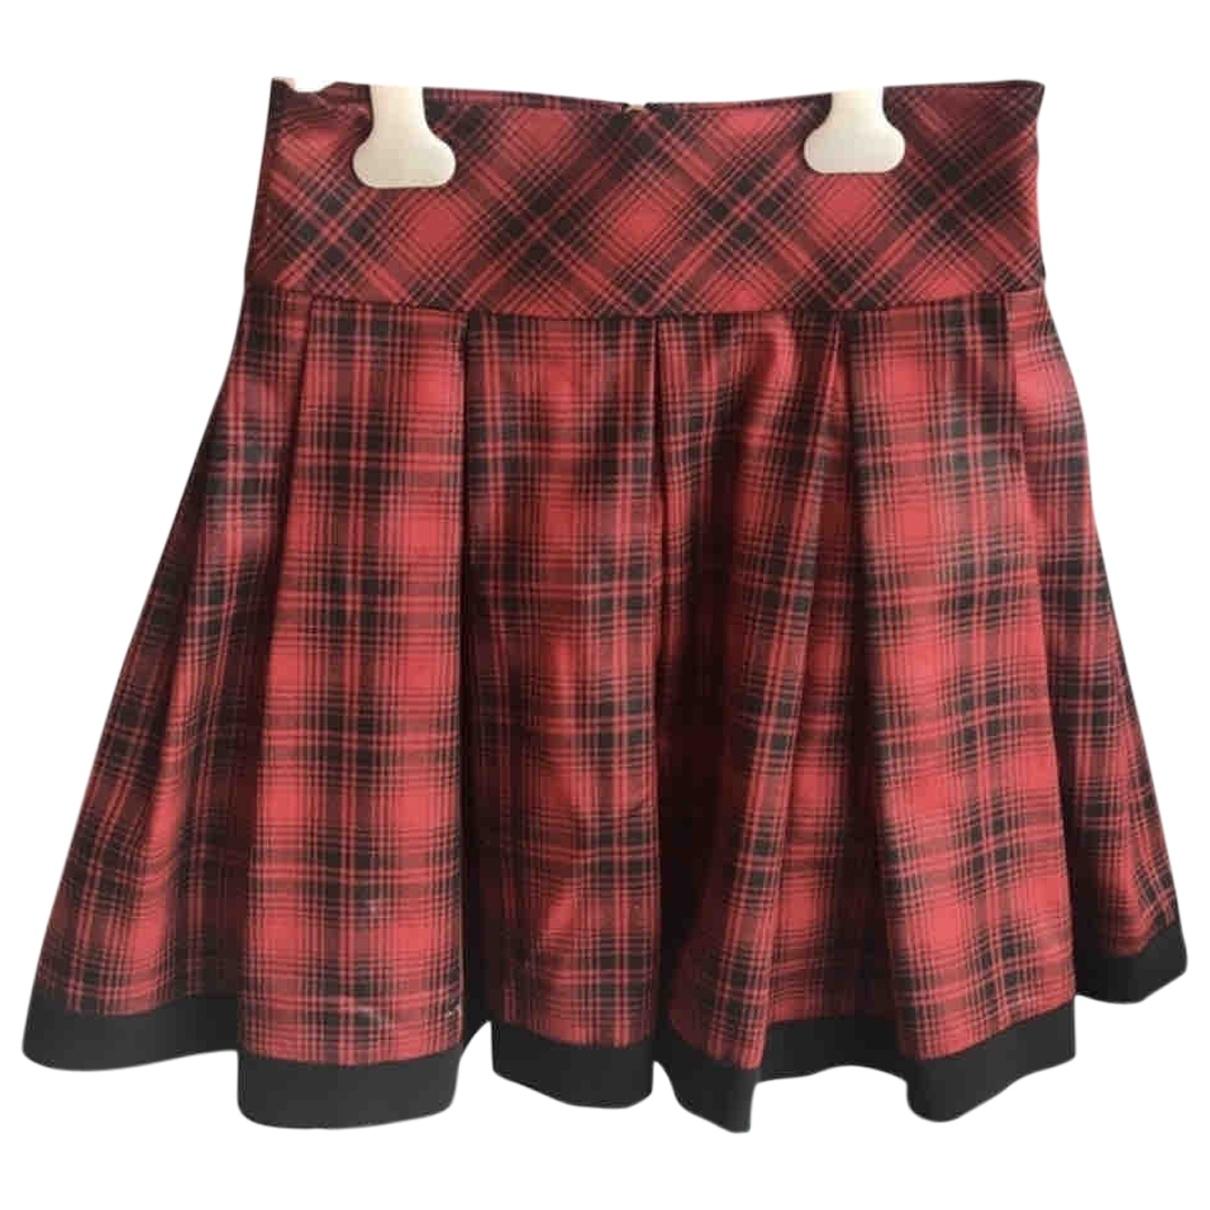 Mangano - Jupe   pour femme en coton - elasthane - rouge